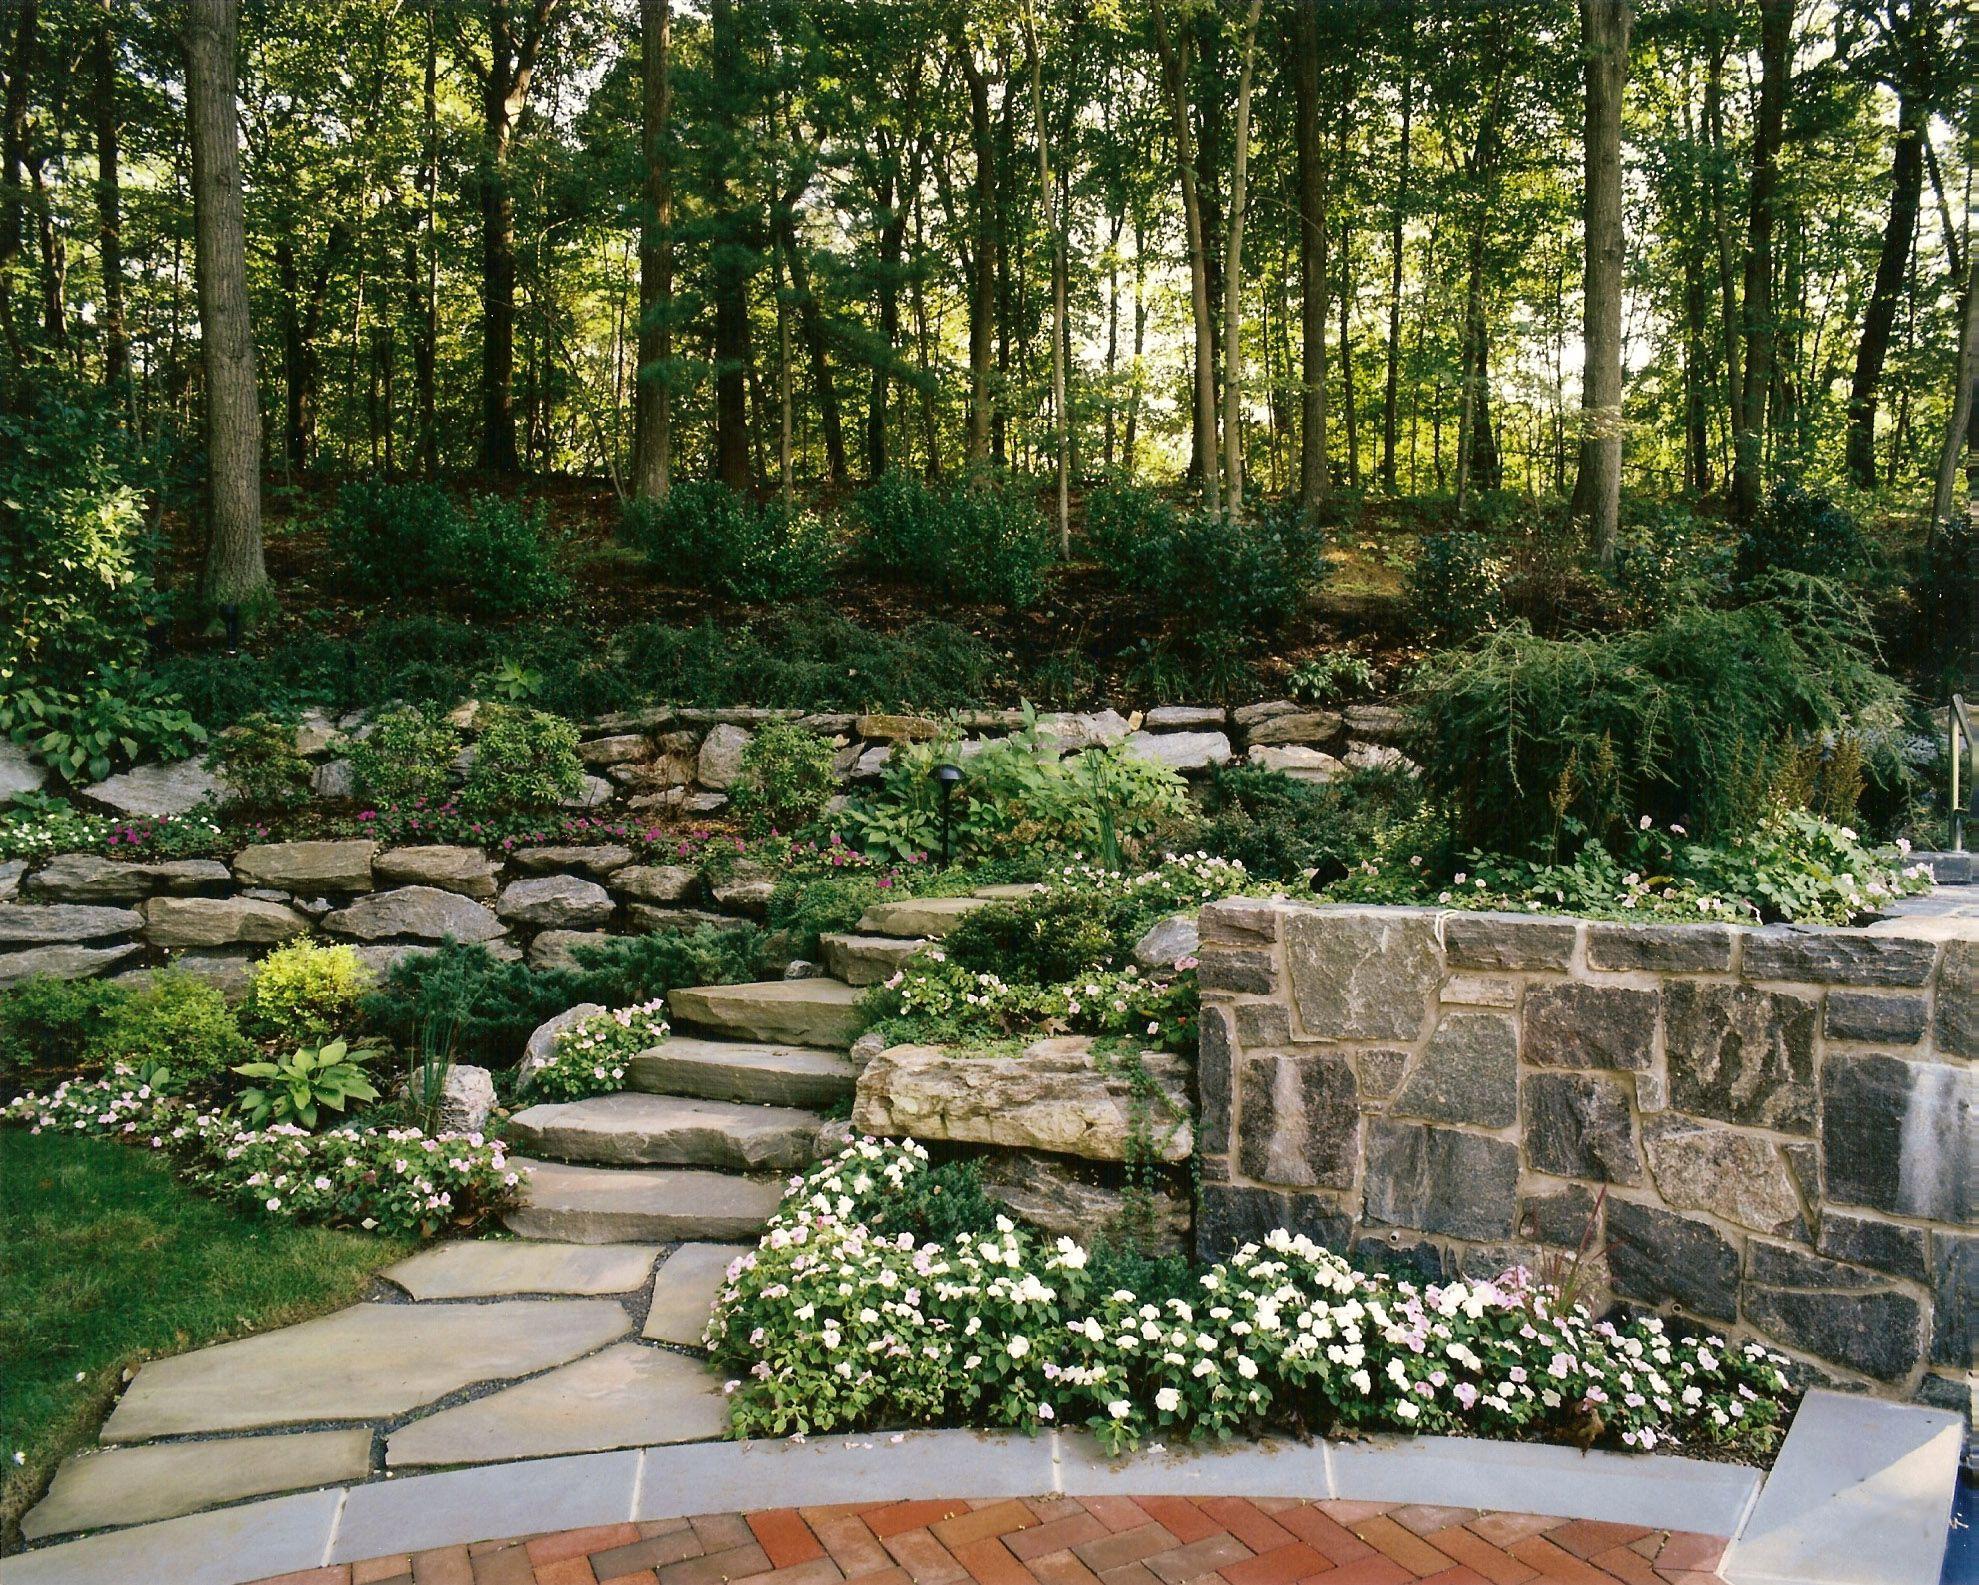 Natural garden landscape  Bluestone slab steps lead to lush secret garden Landscape and